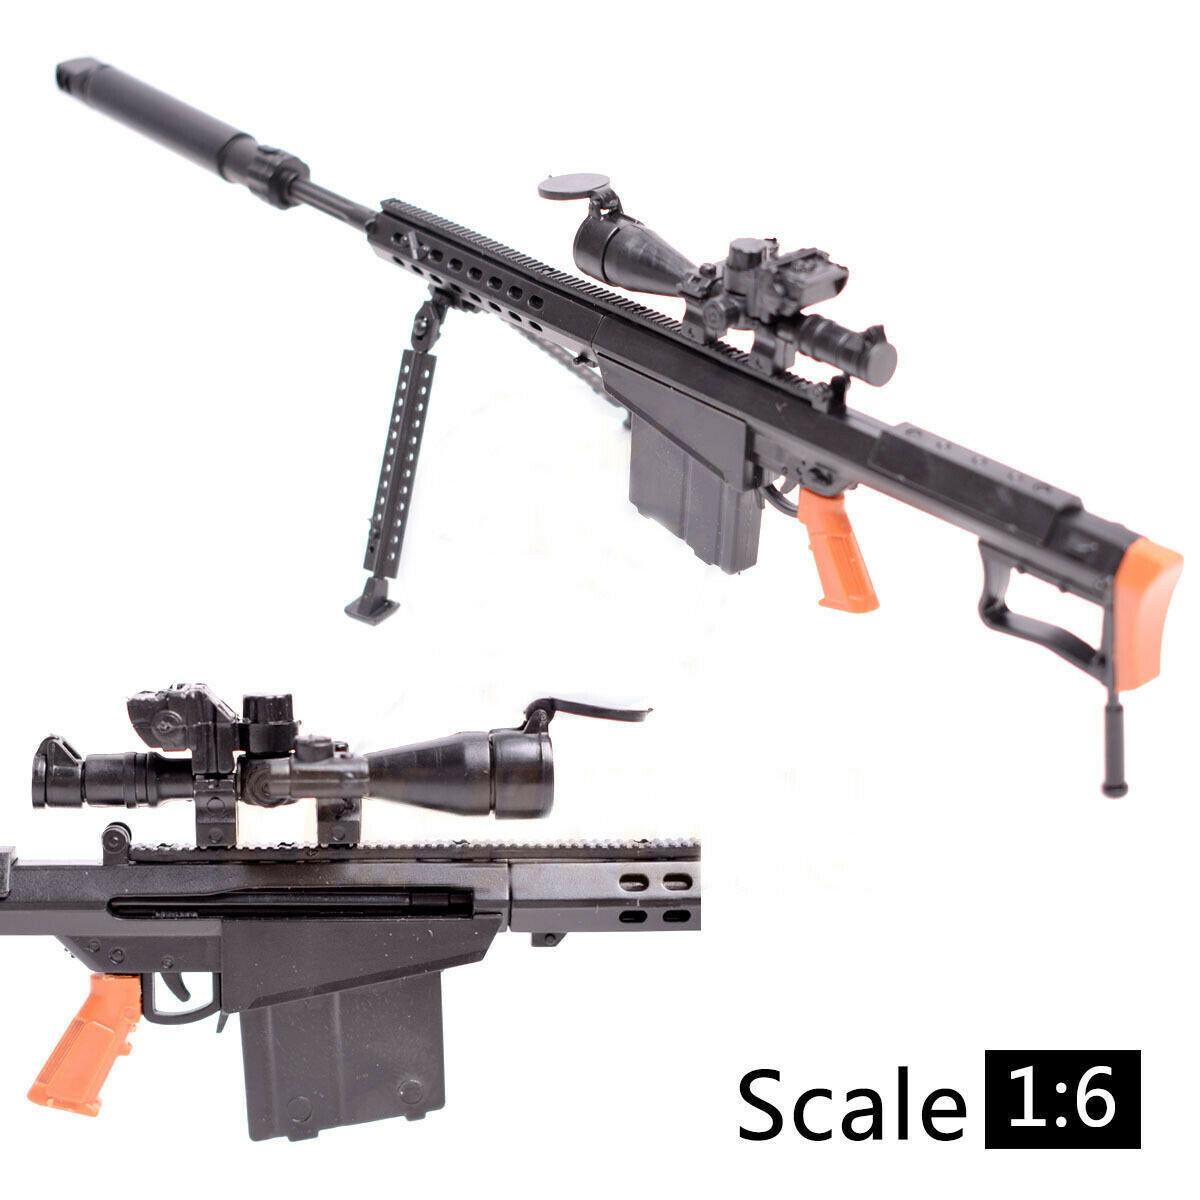 1:6 M82a1 Rifle De Francotirador Barrett Montaje Pistola De Juguete Asamblea Modelo Rompecabezas Edificio De Ladrillos De Plástico De Arma Para Figura De Acción Efecto Evidente